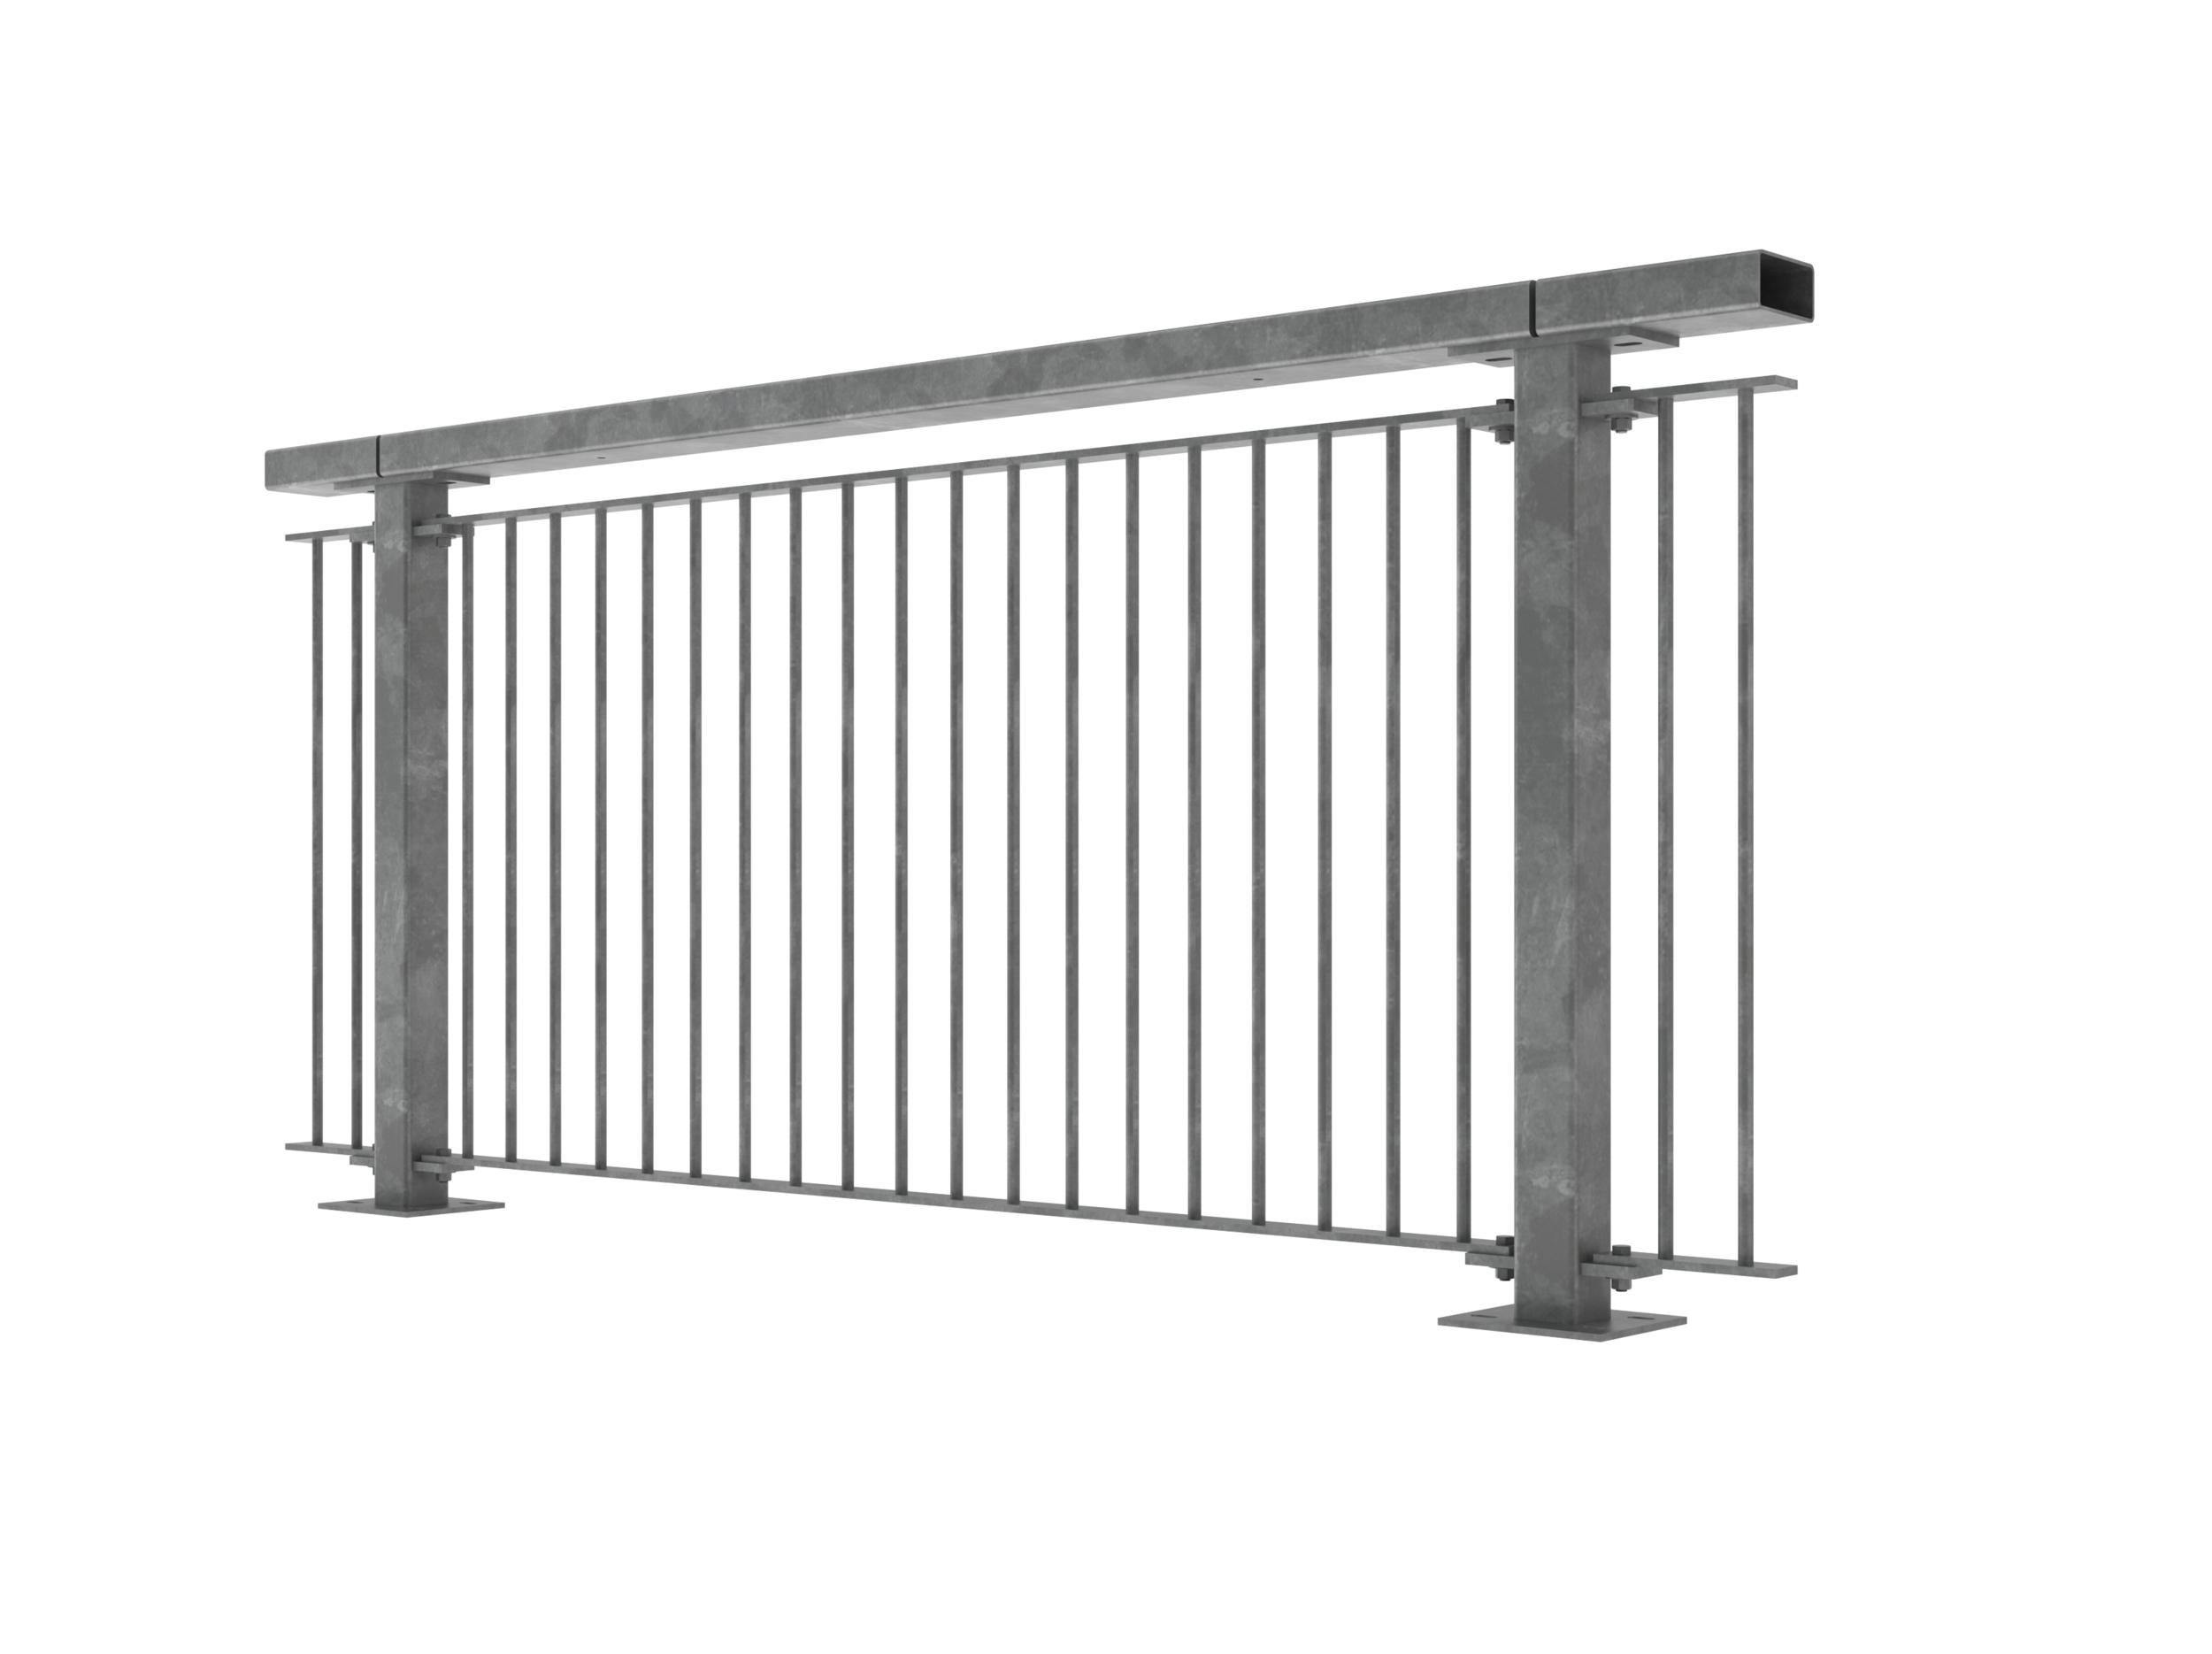 Walkway bridge rails